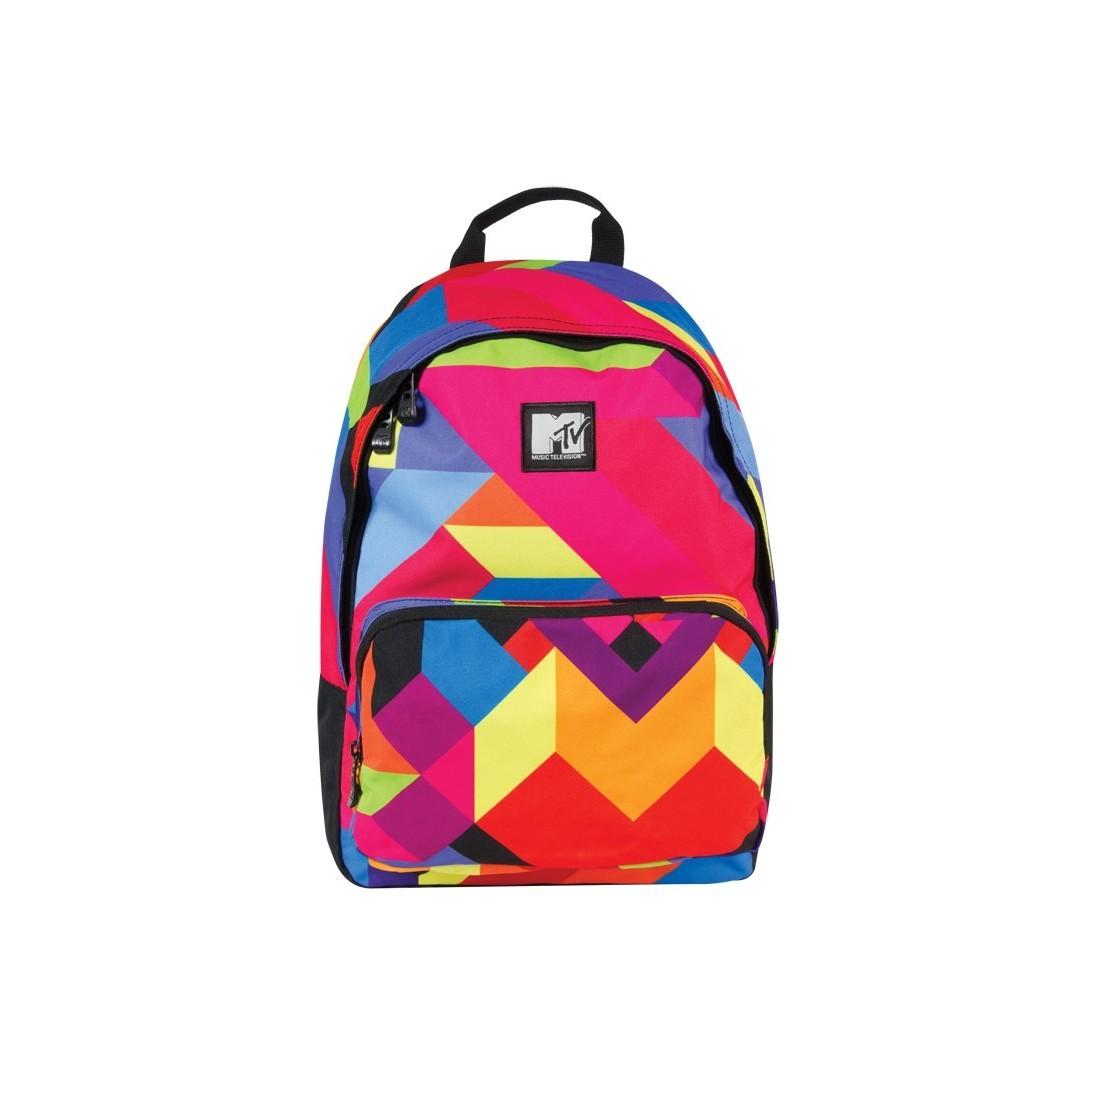 Plecak młodzieżowy Coolpack MTV Colors - plecak-tornister.pl